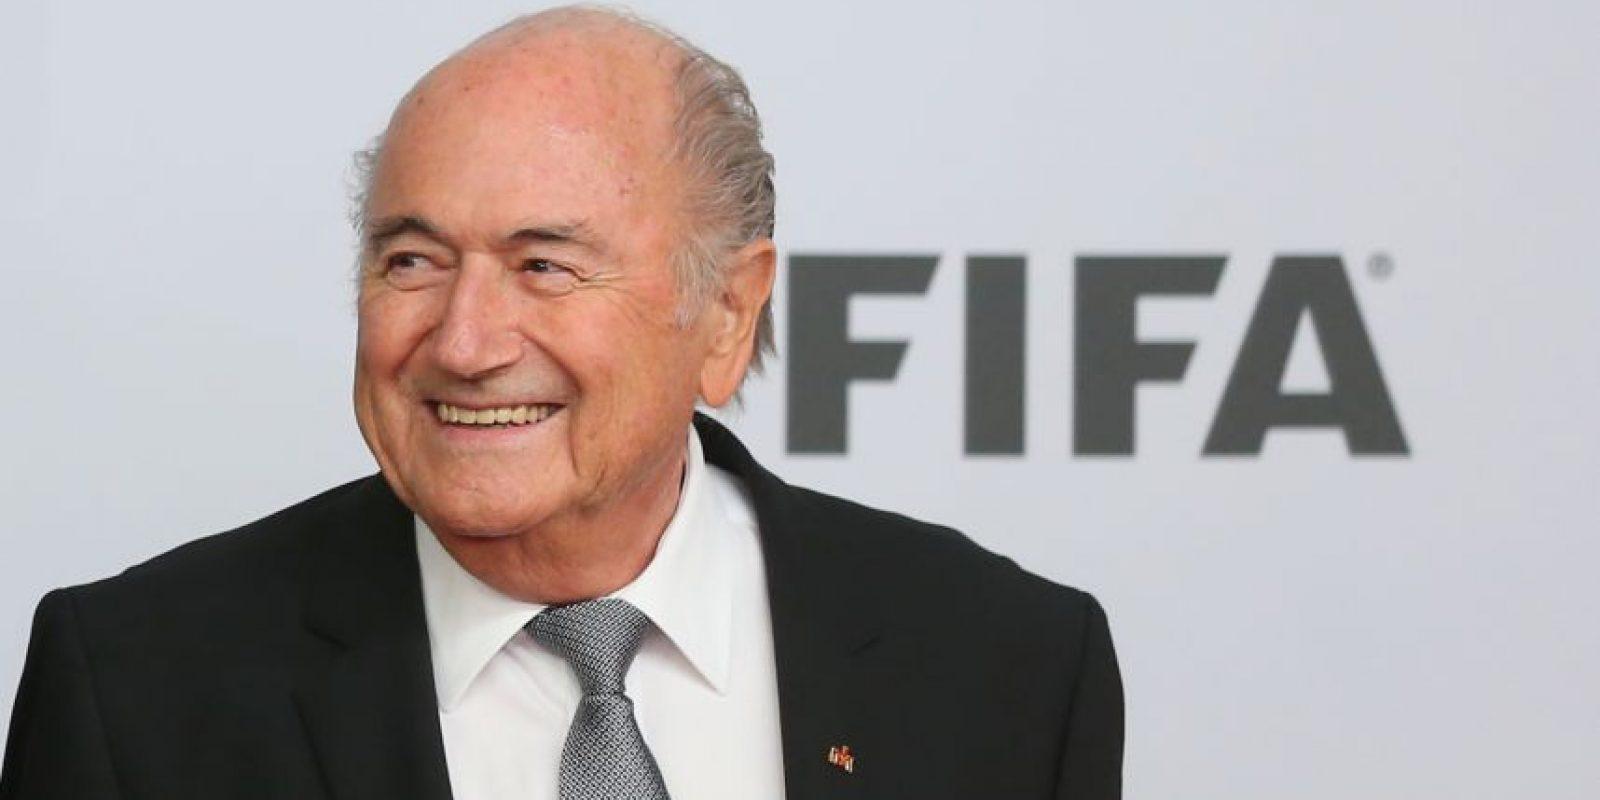 La fortuna de Blatter se calcula en 215 millones de dólares Foto:Getty Images